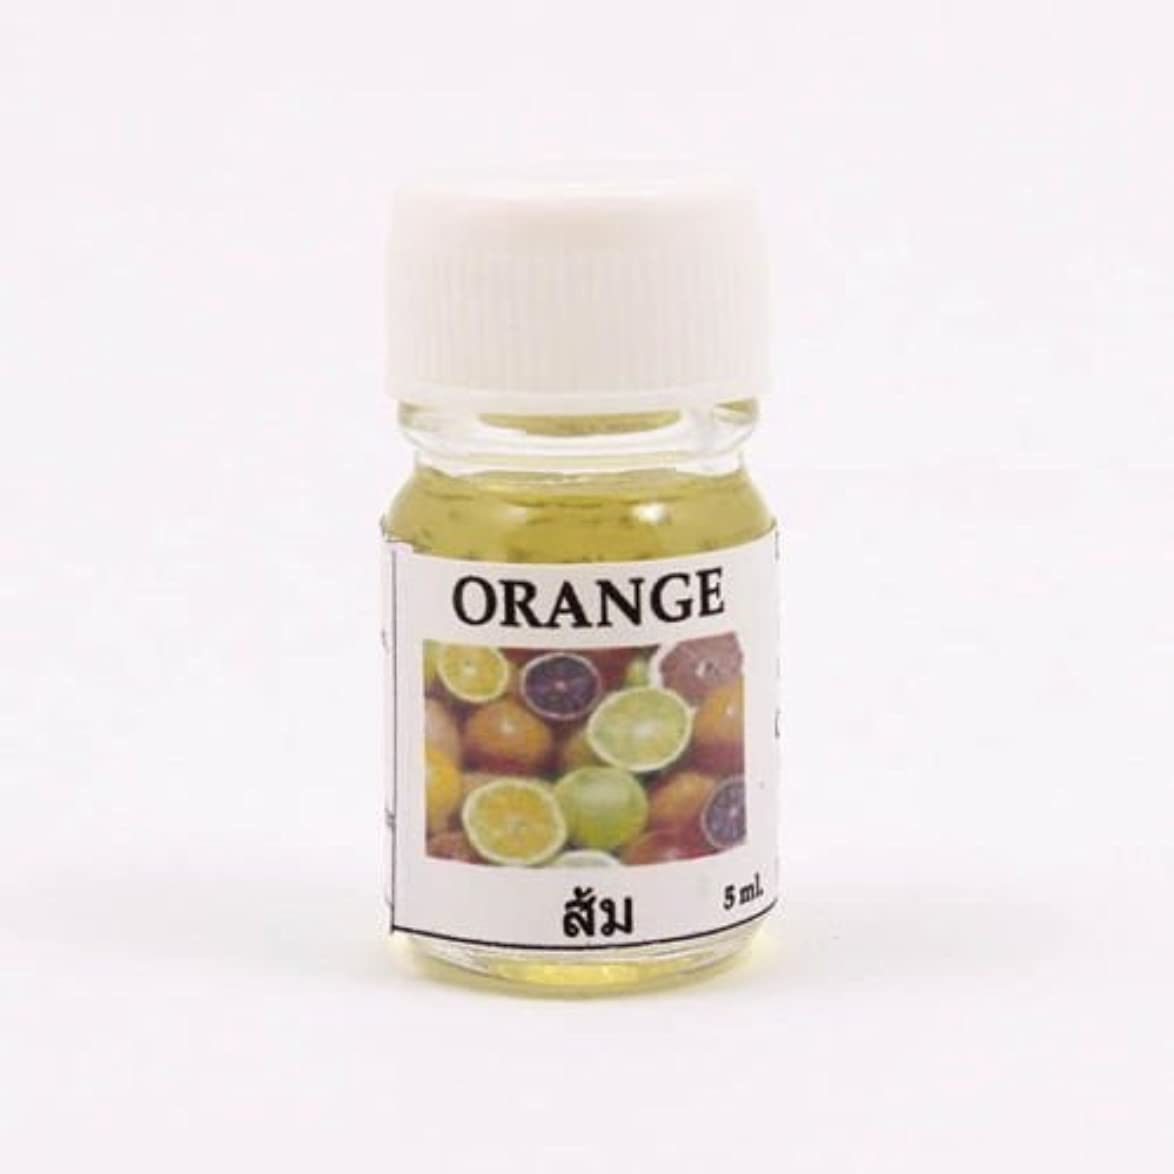 6X Orange Aroma Fragrance Essential Oil 5ML. (cc) Diffuser Burner Therapy